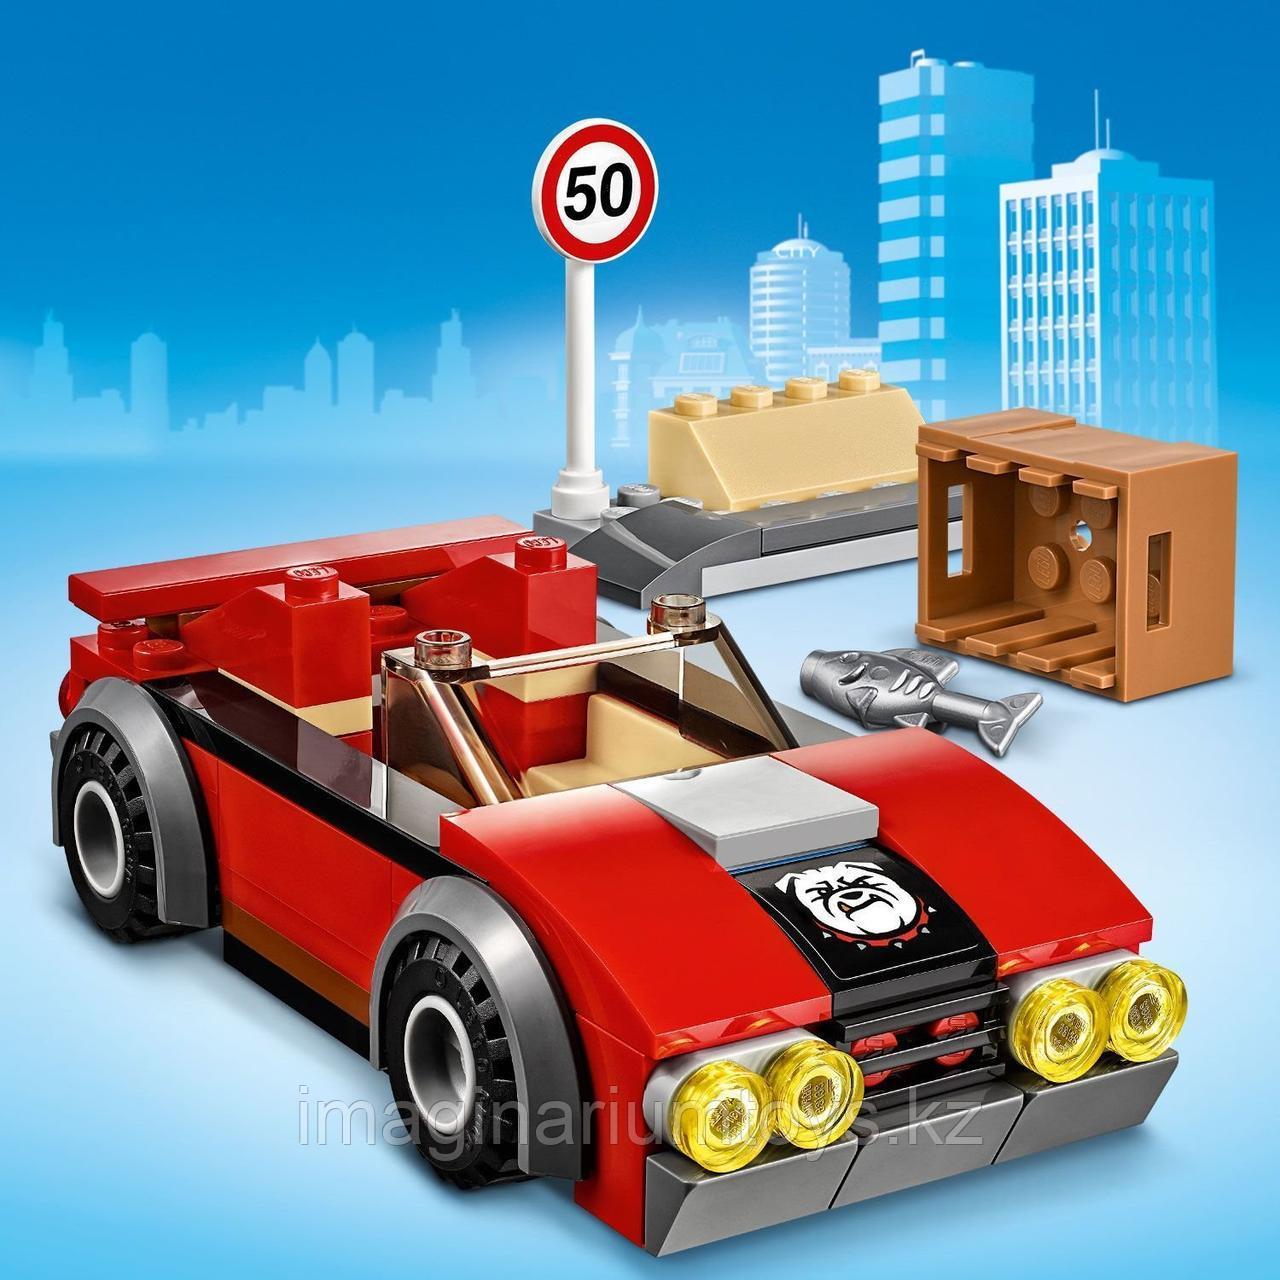 Конструктор LEGO City Лего Город Арест на шоссе 60242 - фото 2